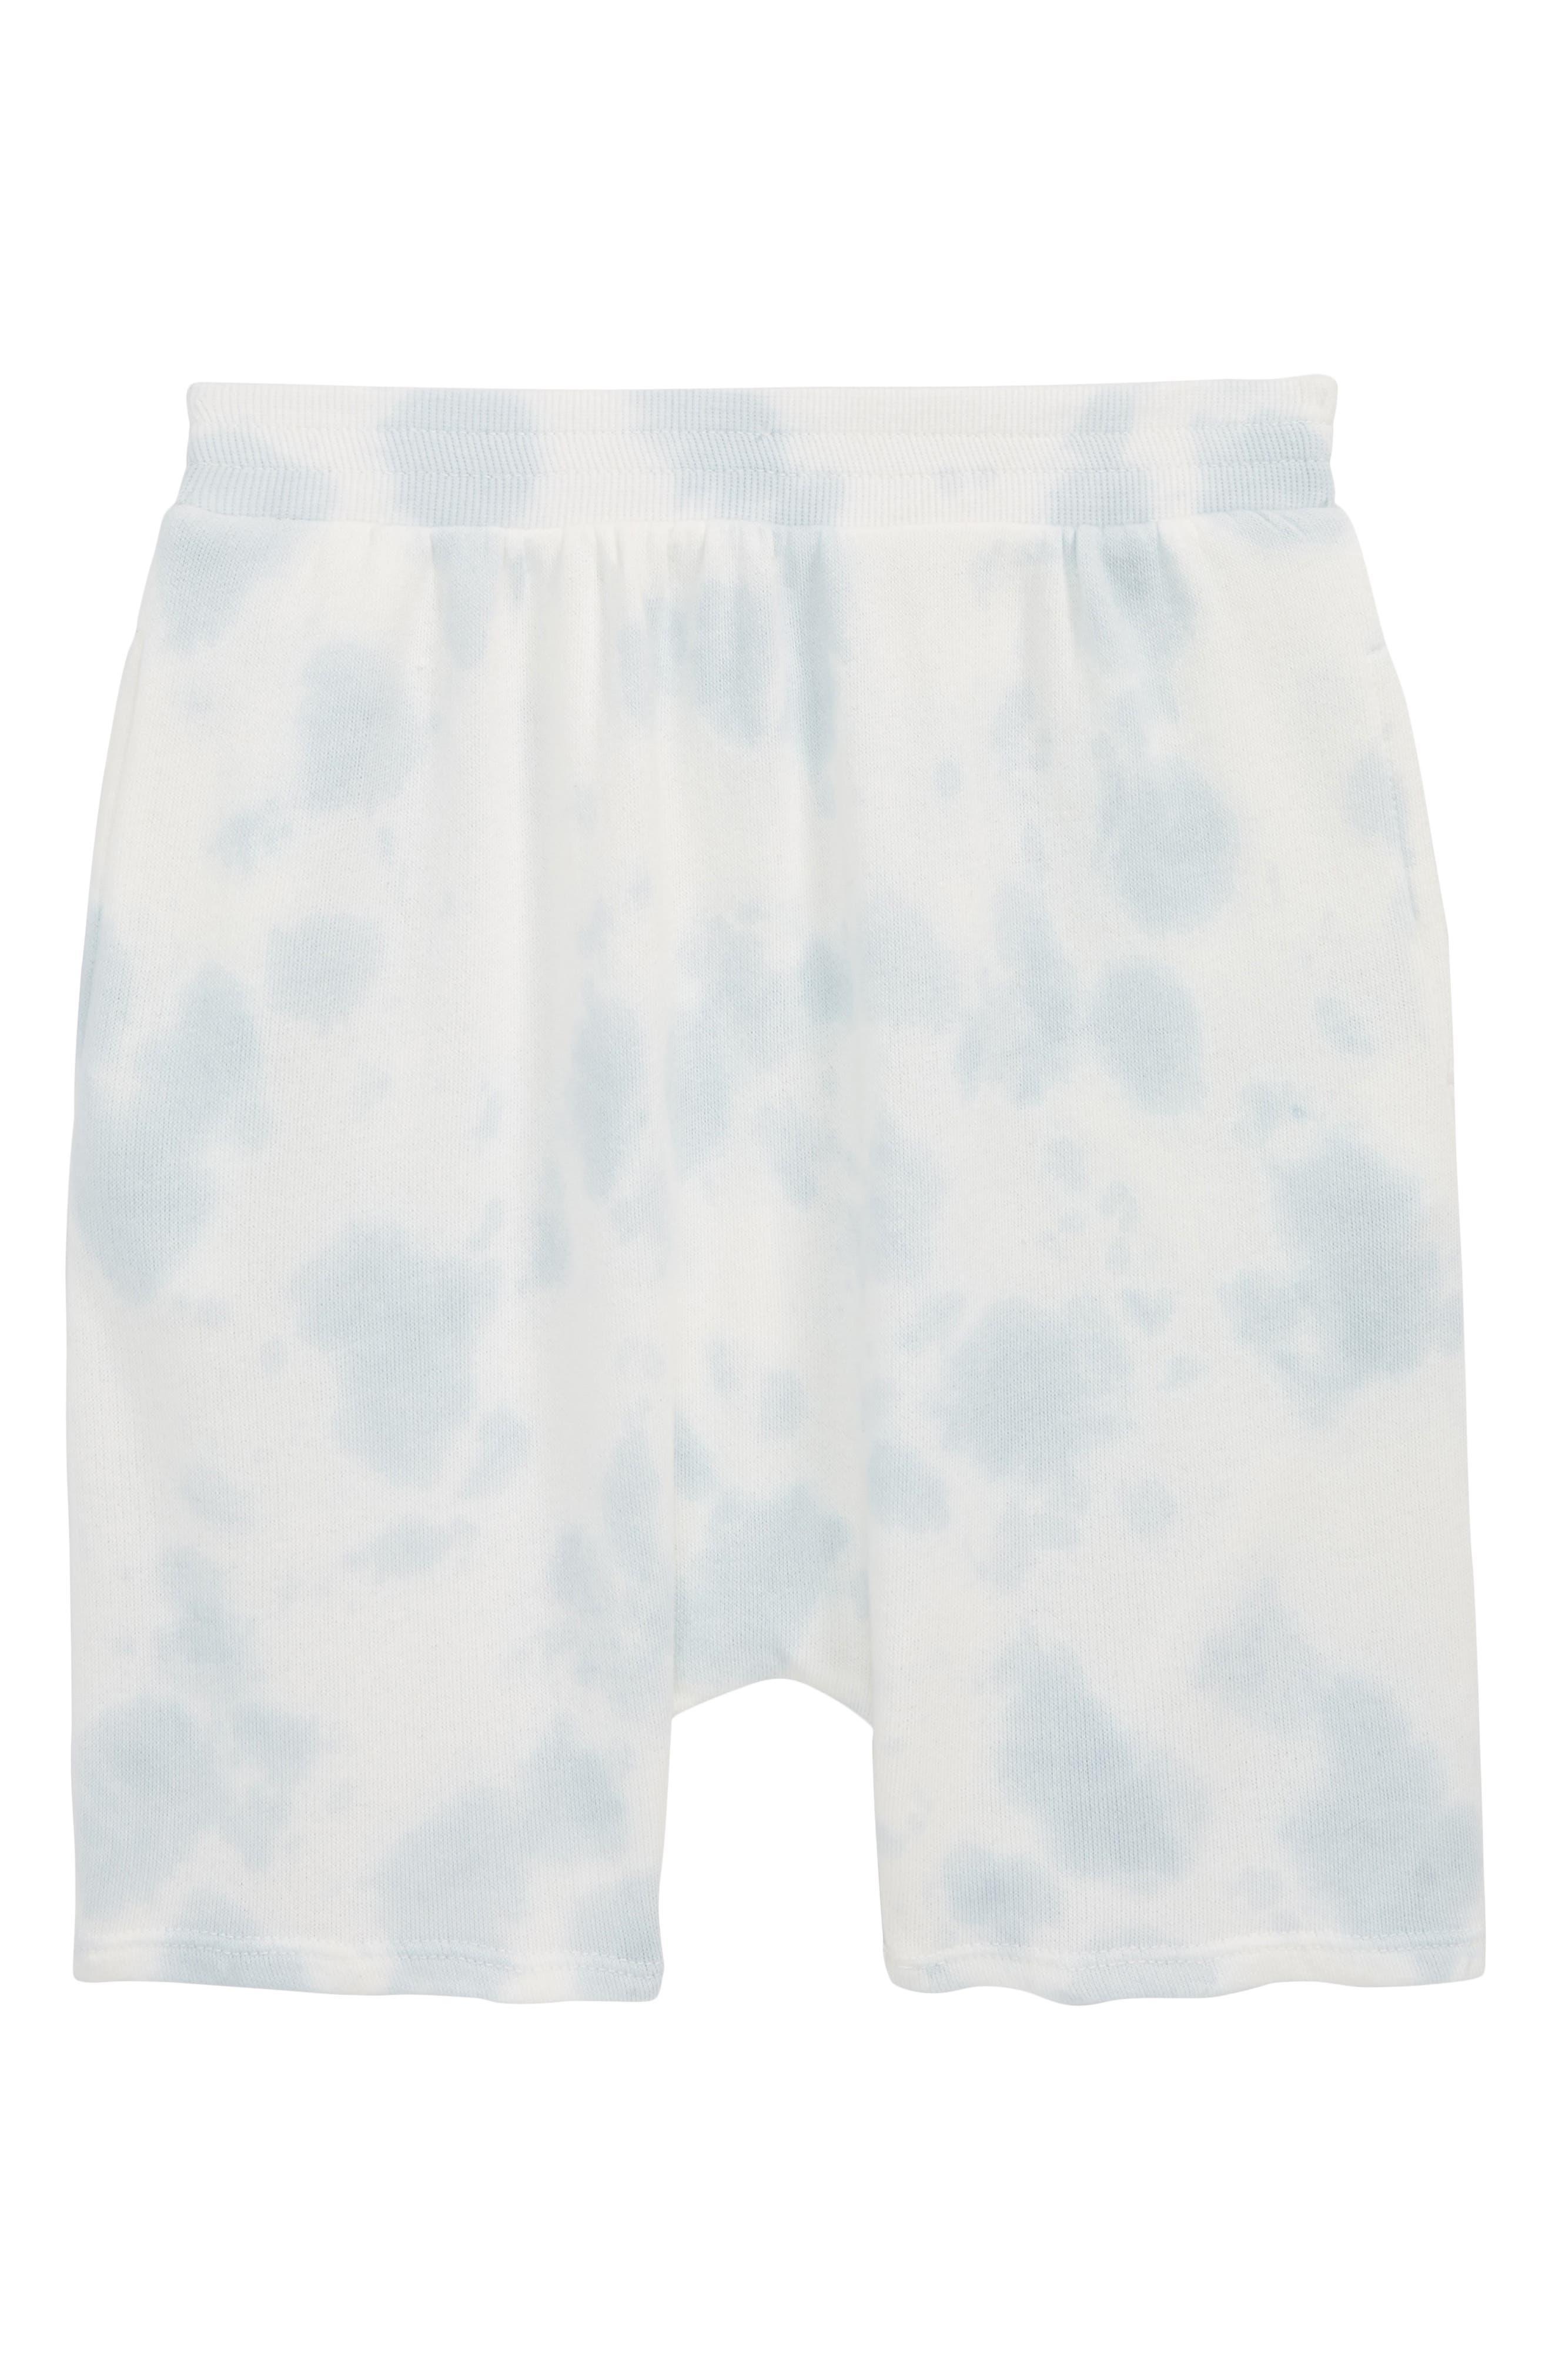 Tie Dye Shorts,                         Main,                         color, 450